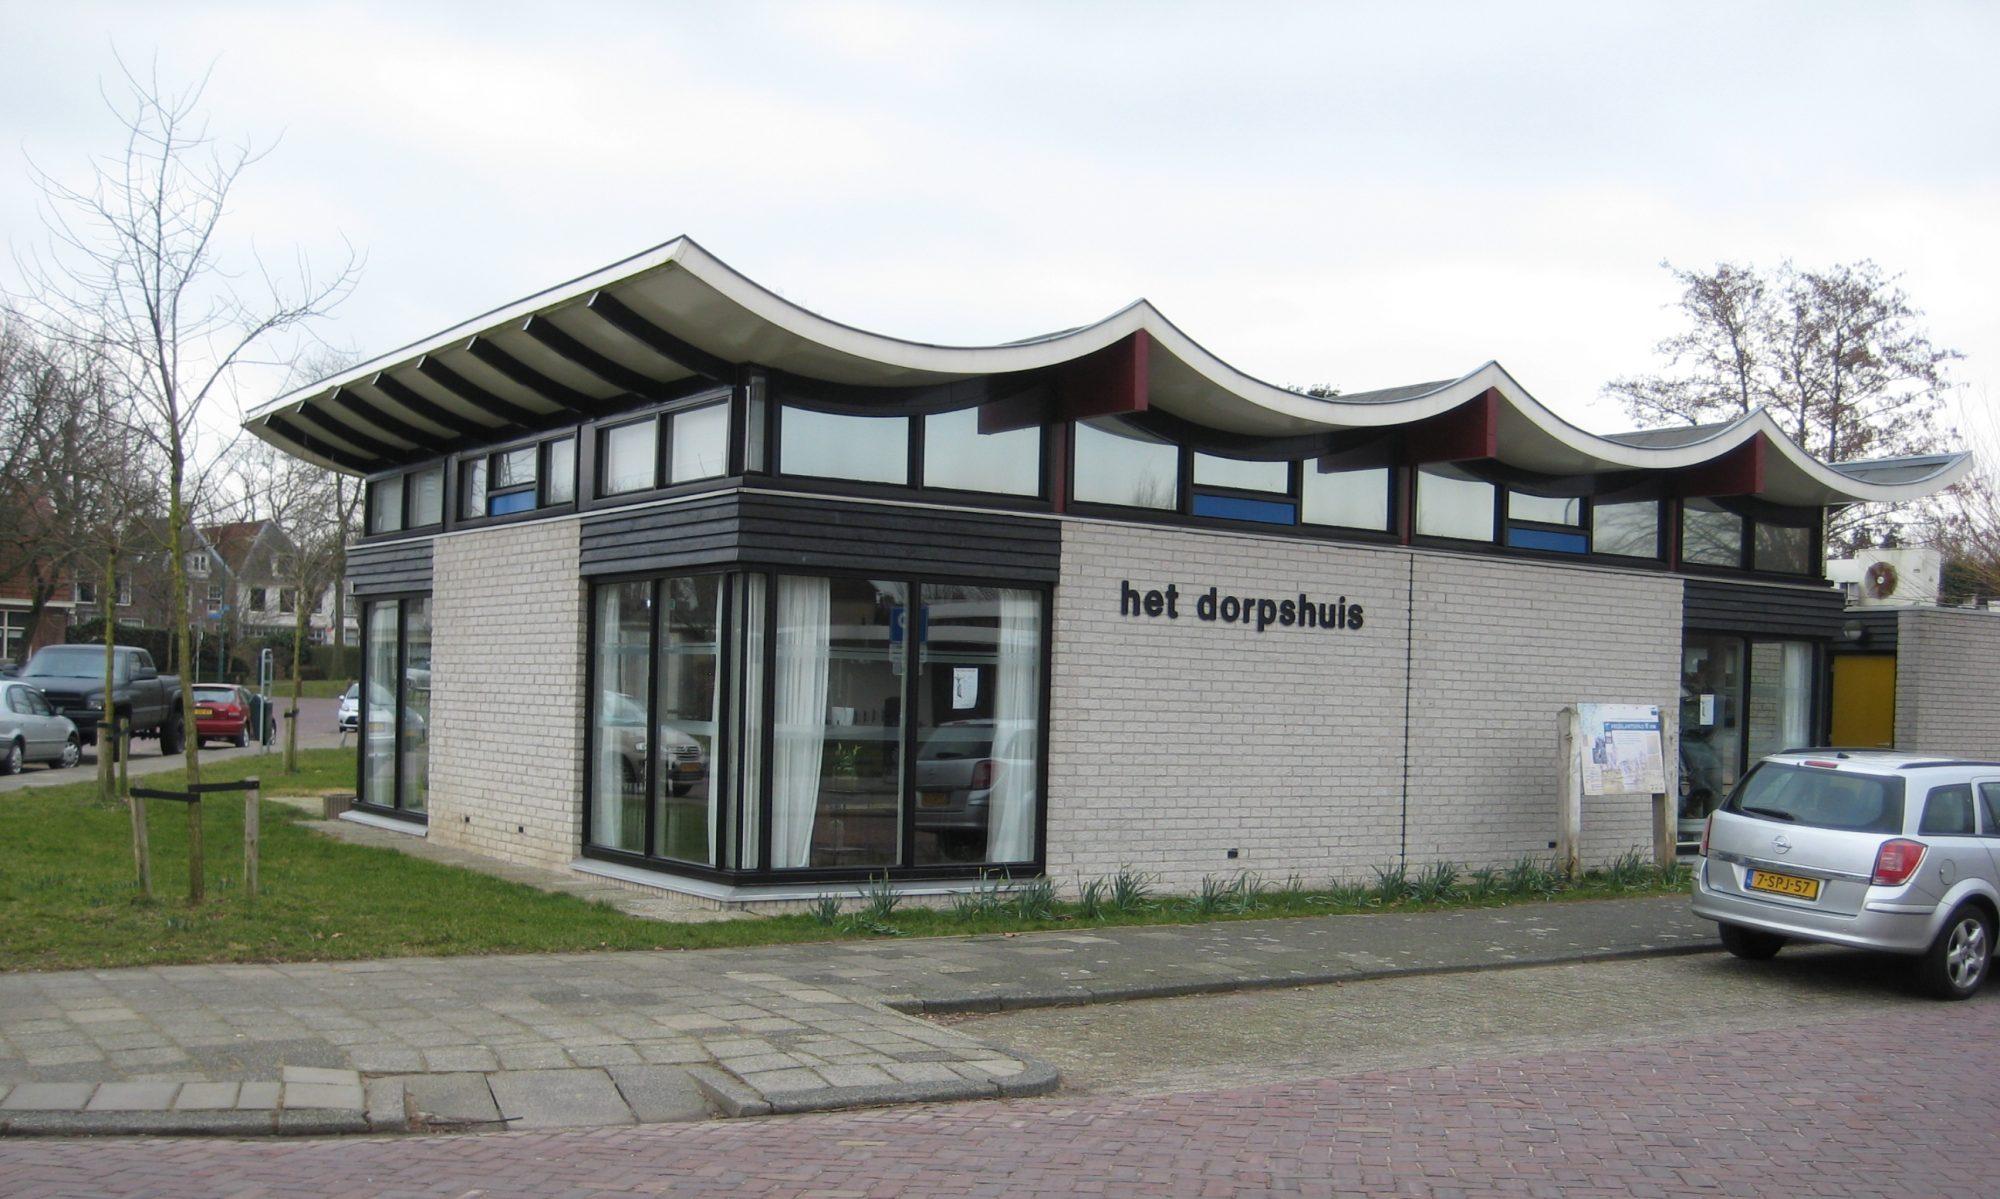 Dorpshuis Vreeland